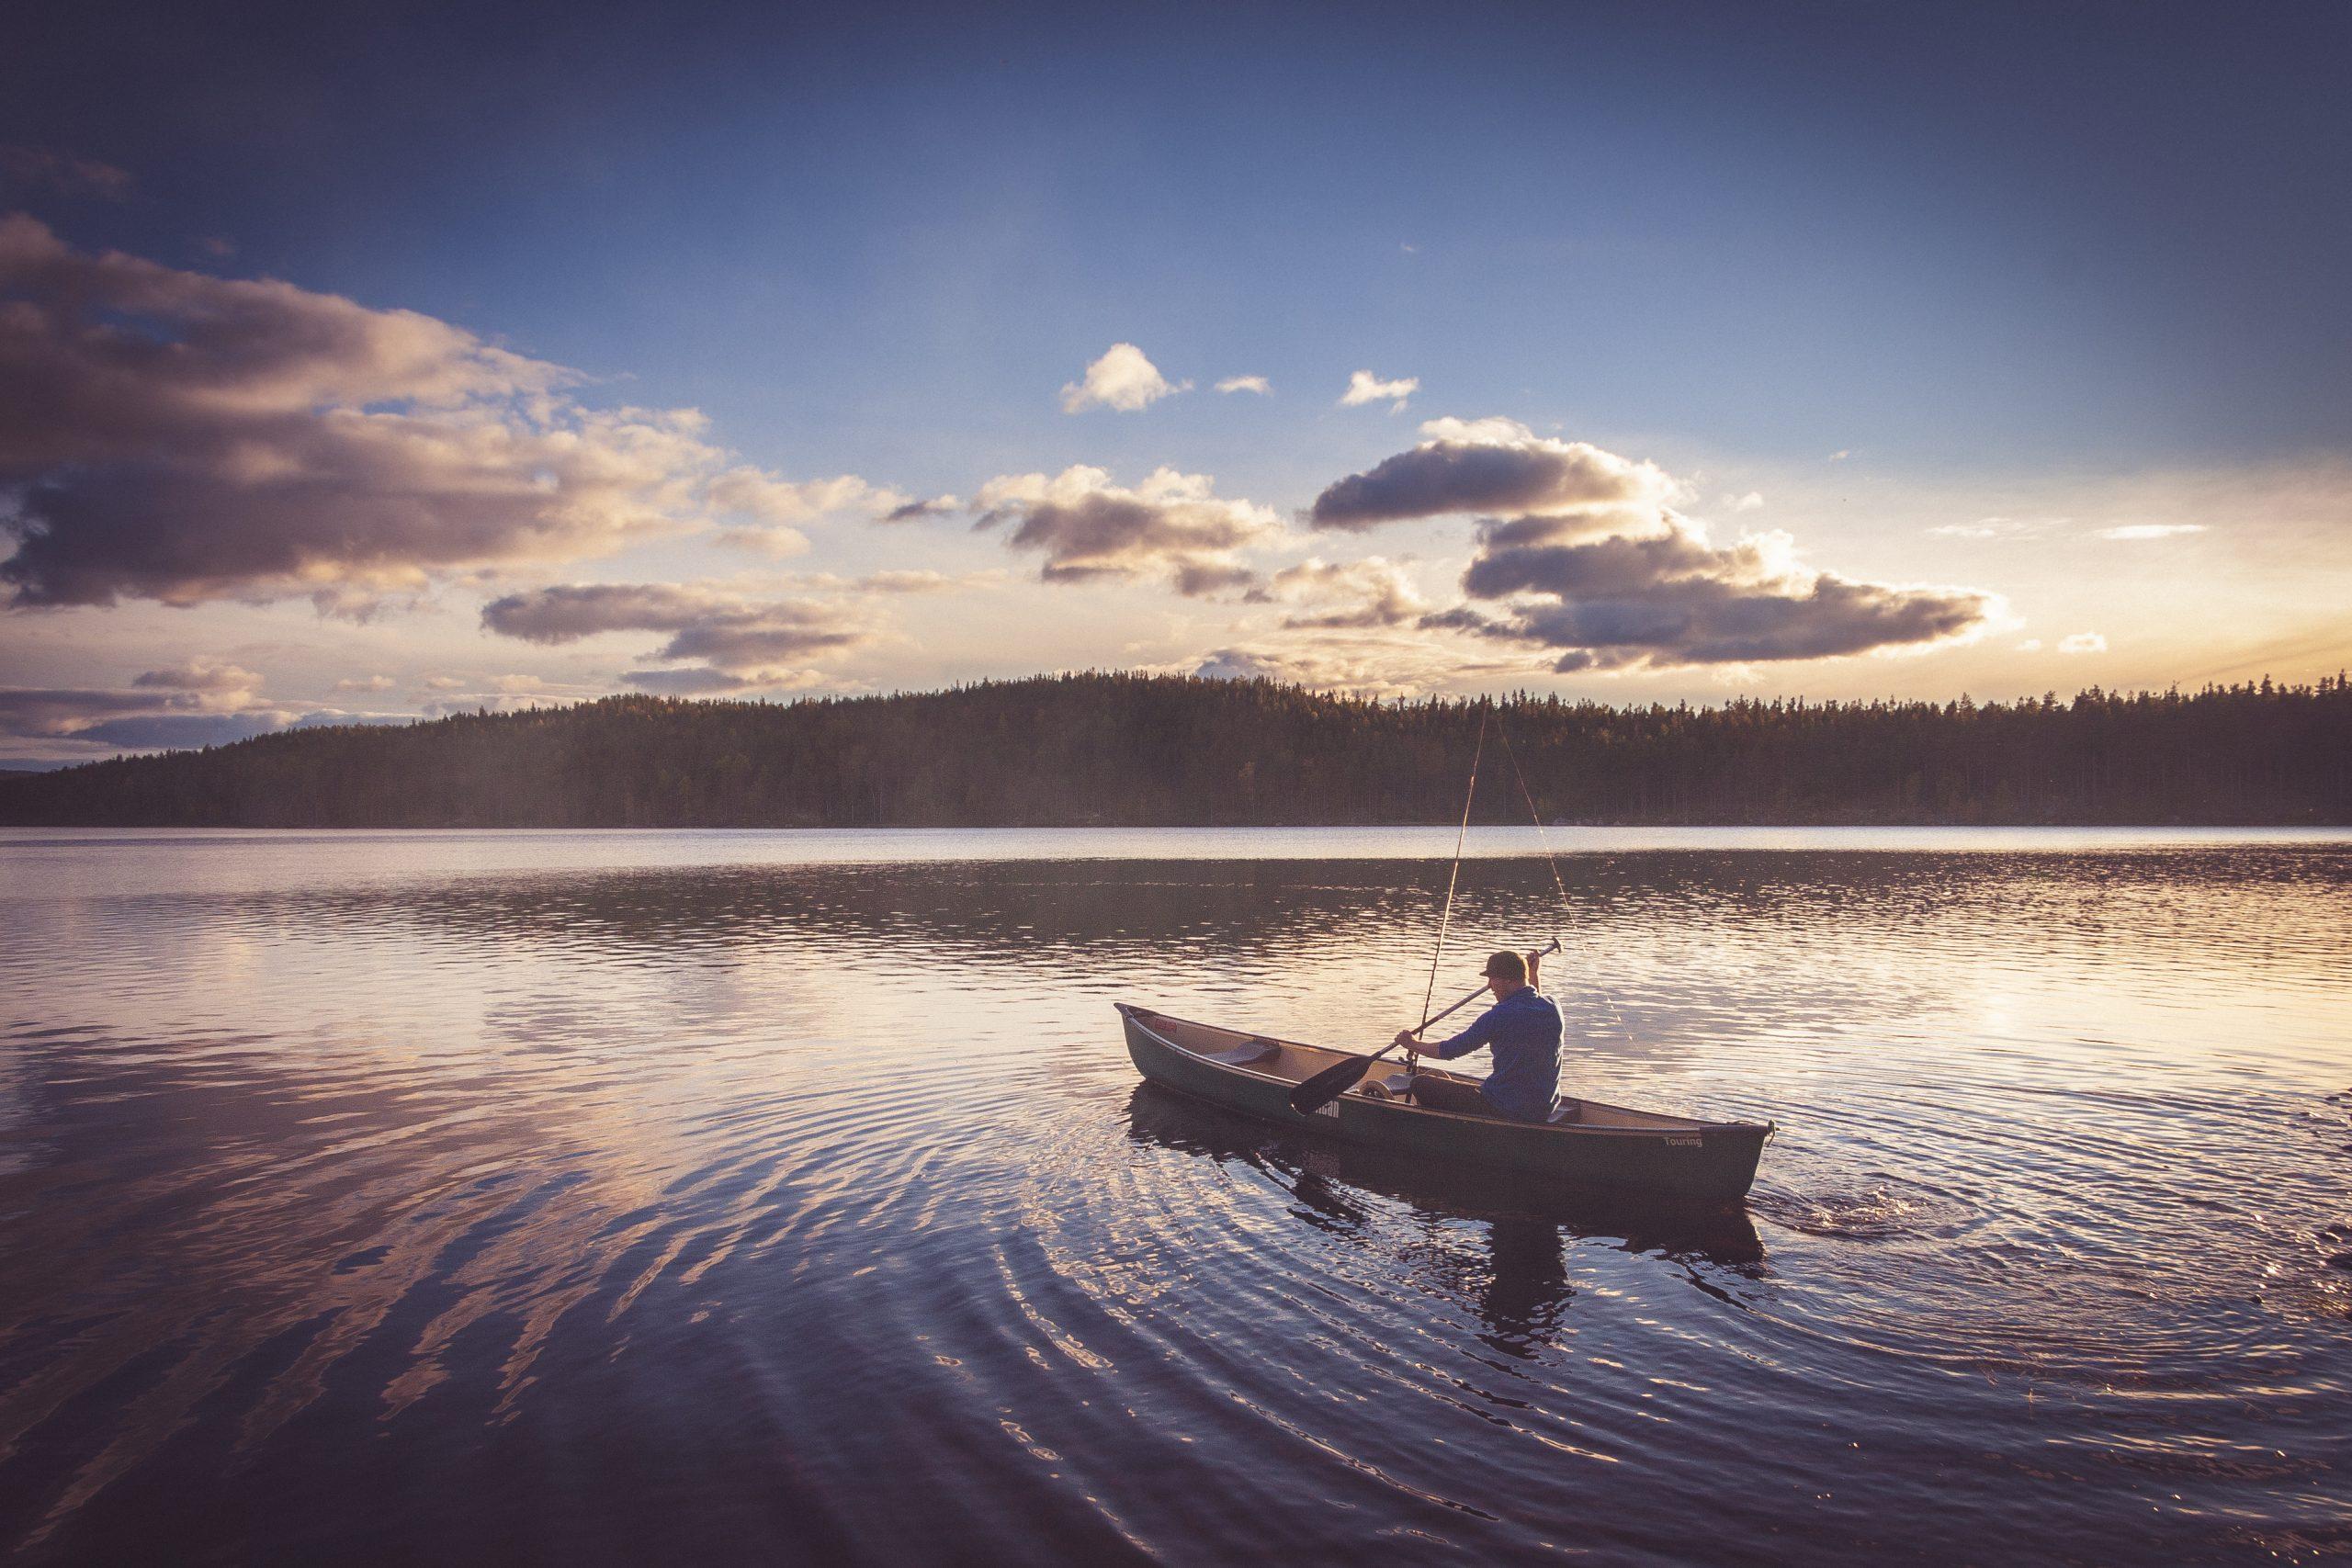 canoeing across a lake